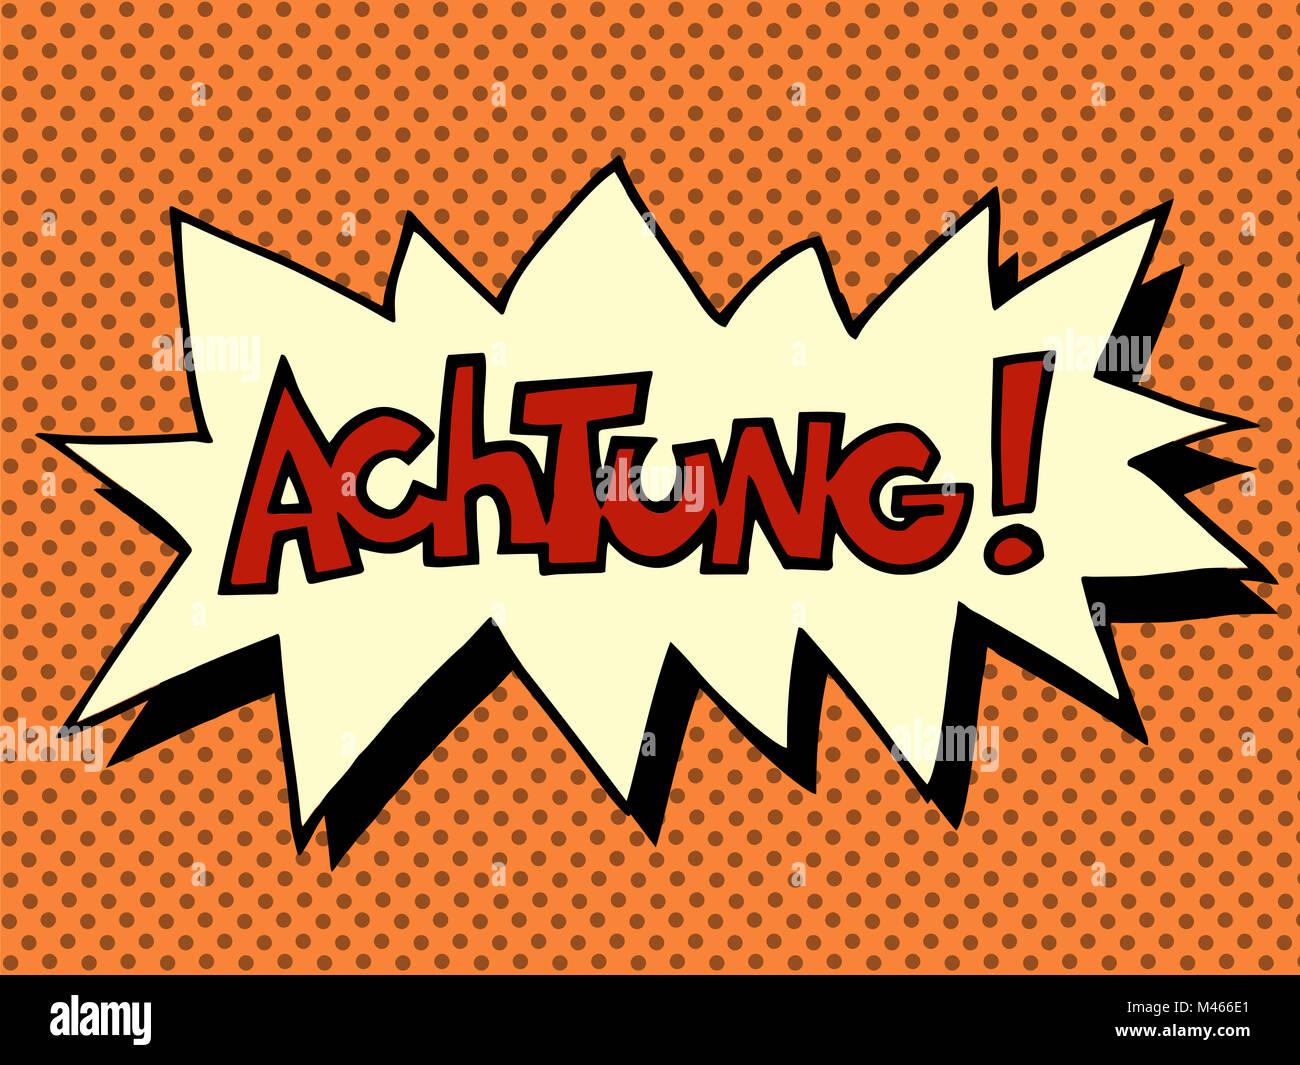 Achtung warning German language Stock Photo